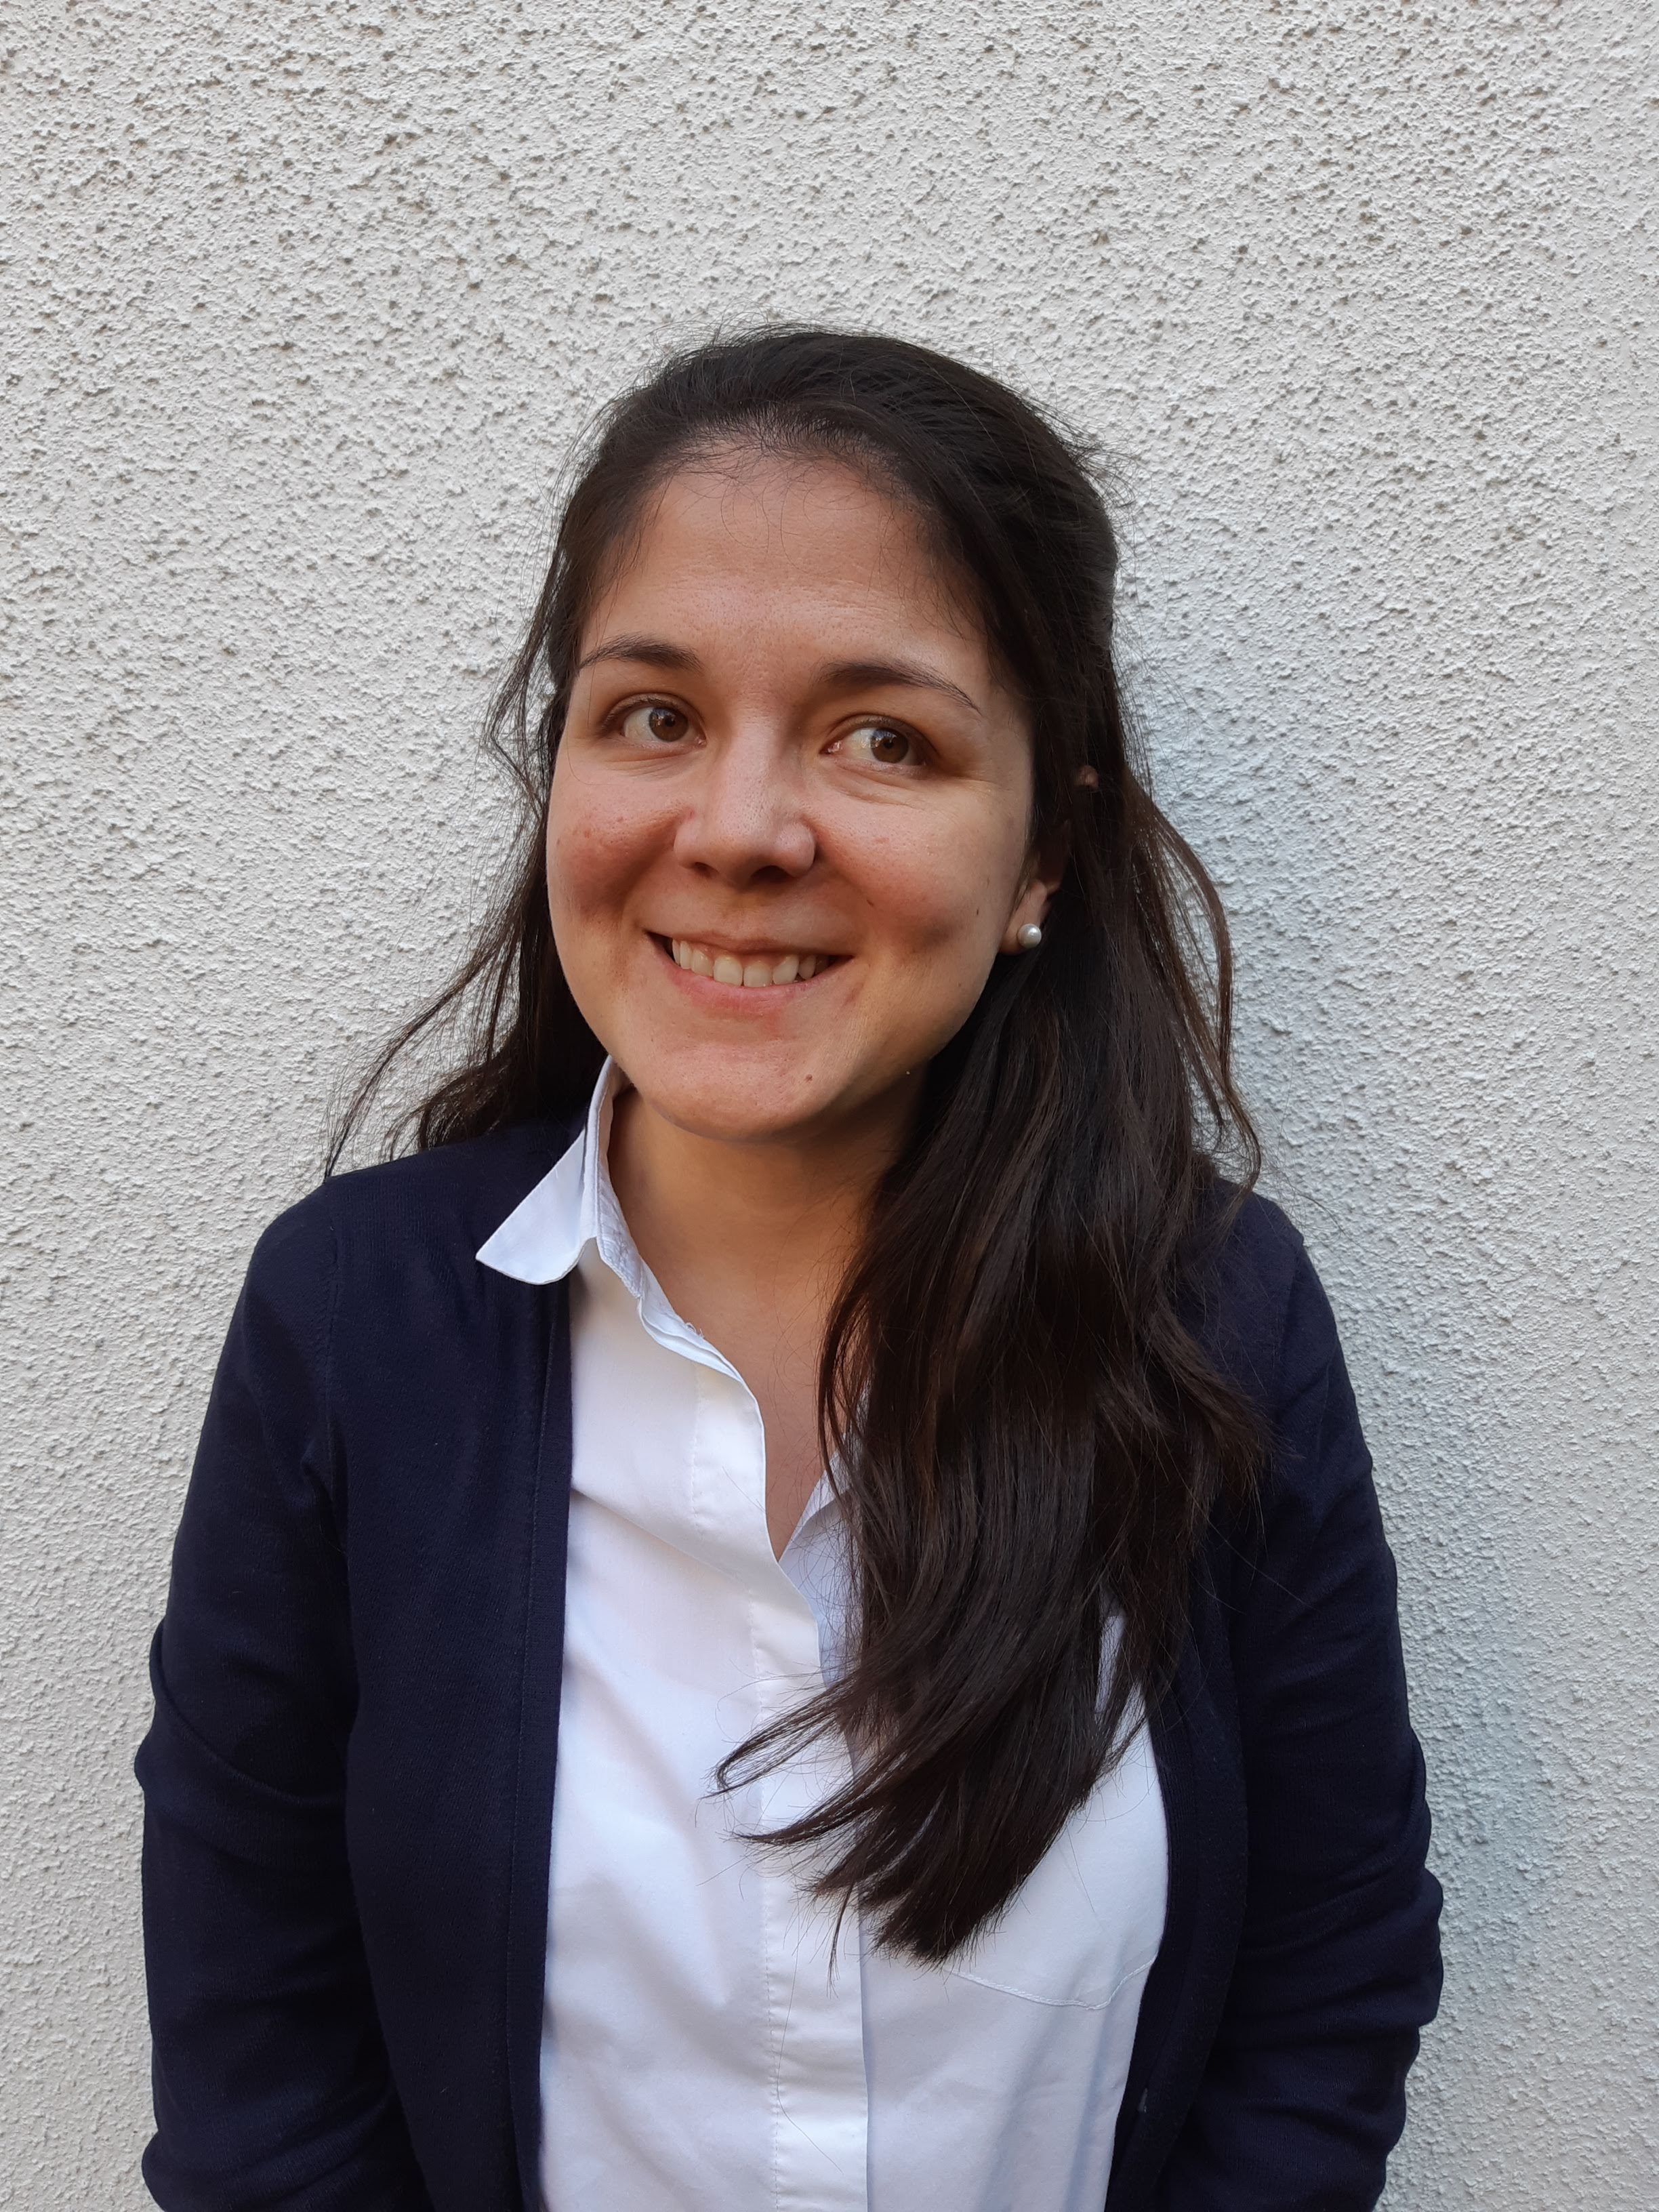 Yurley Adriana Fernandez Padilla